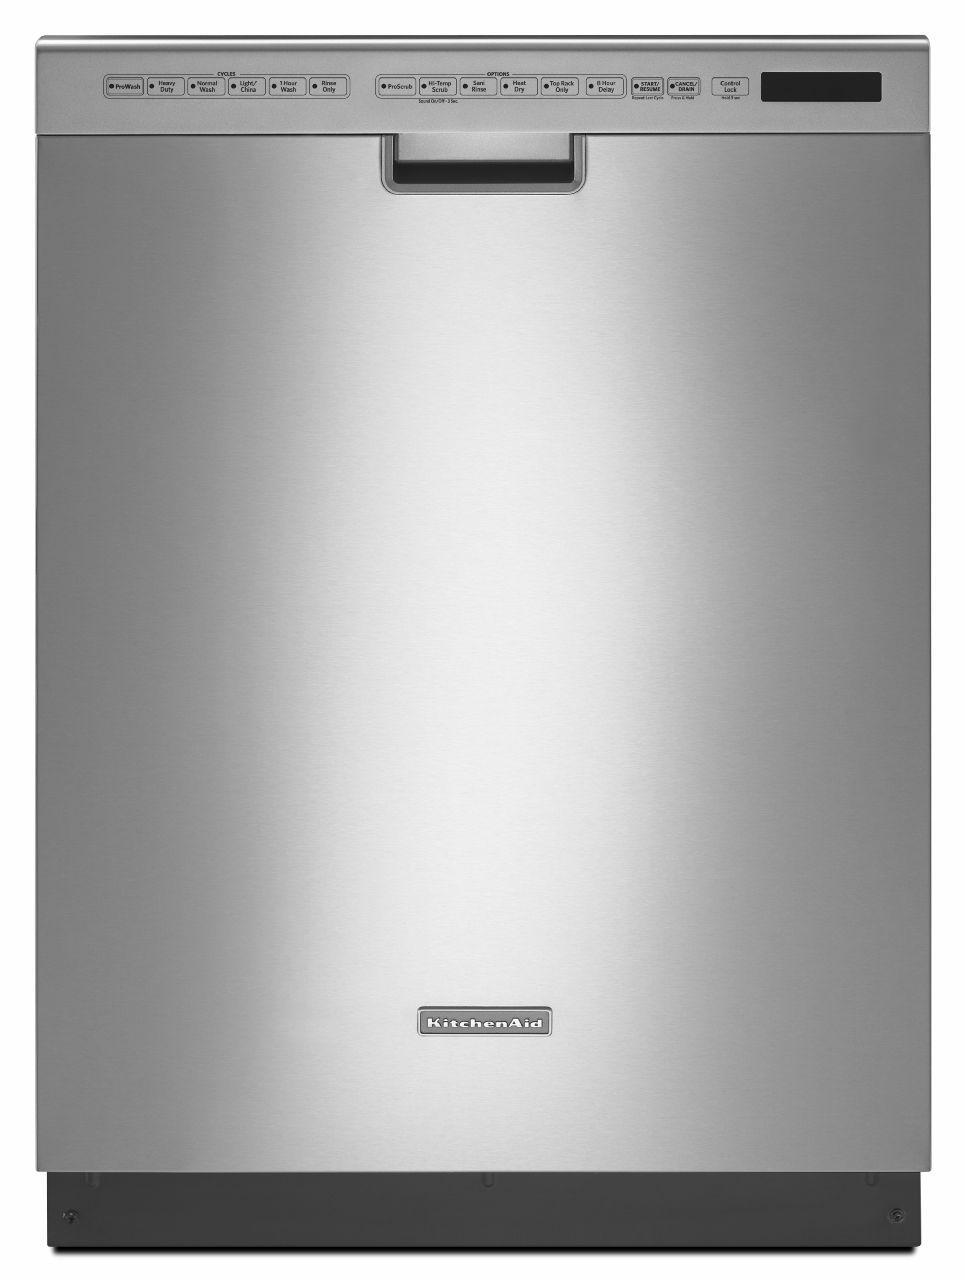 "KitchenAid Dishwashers 24"" Built-In Dishwasher - Item Number: KDFE454CSS"